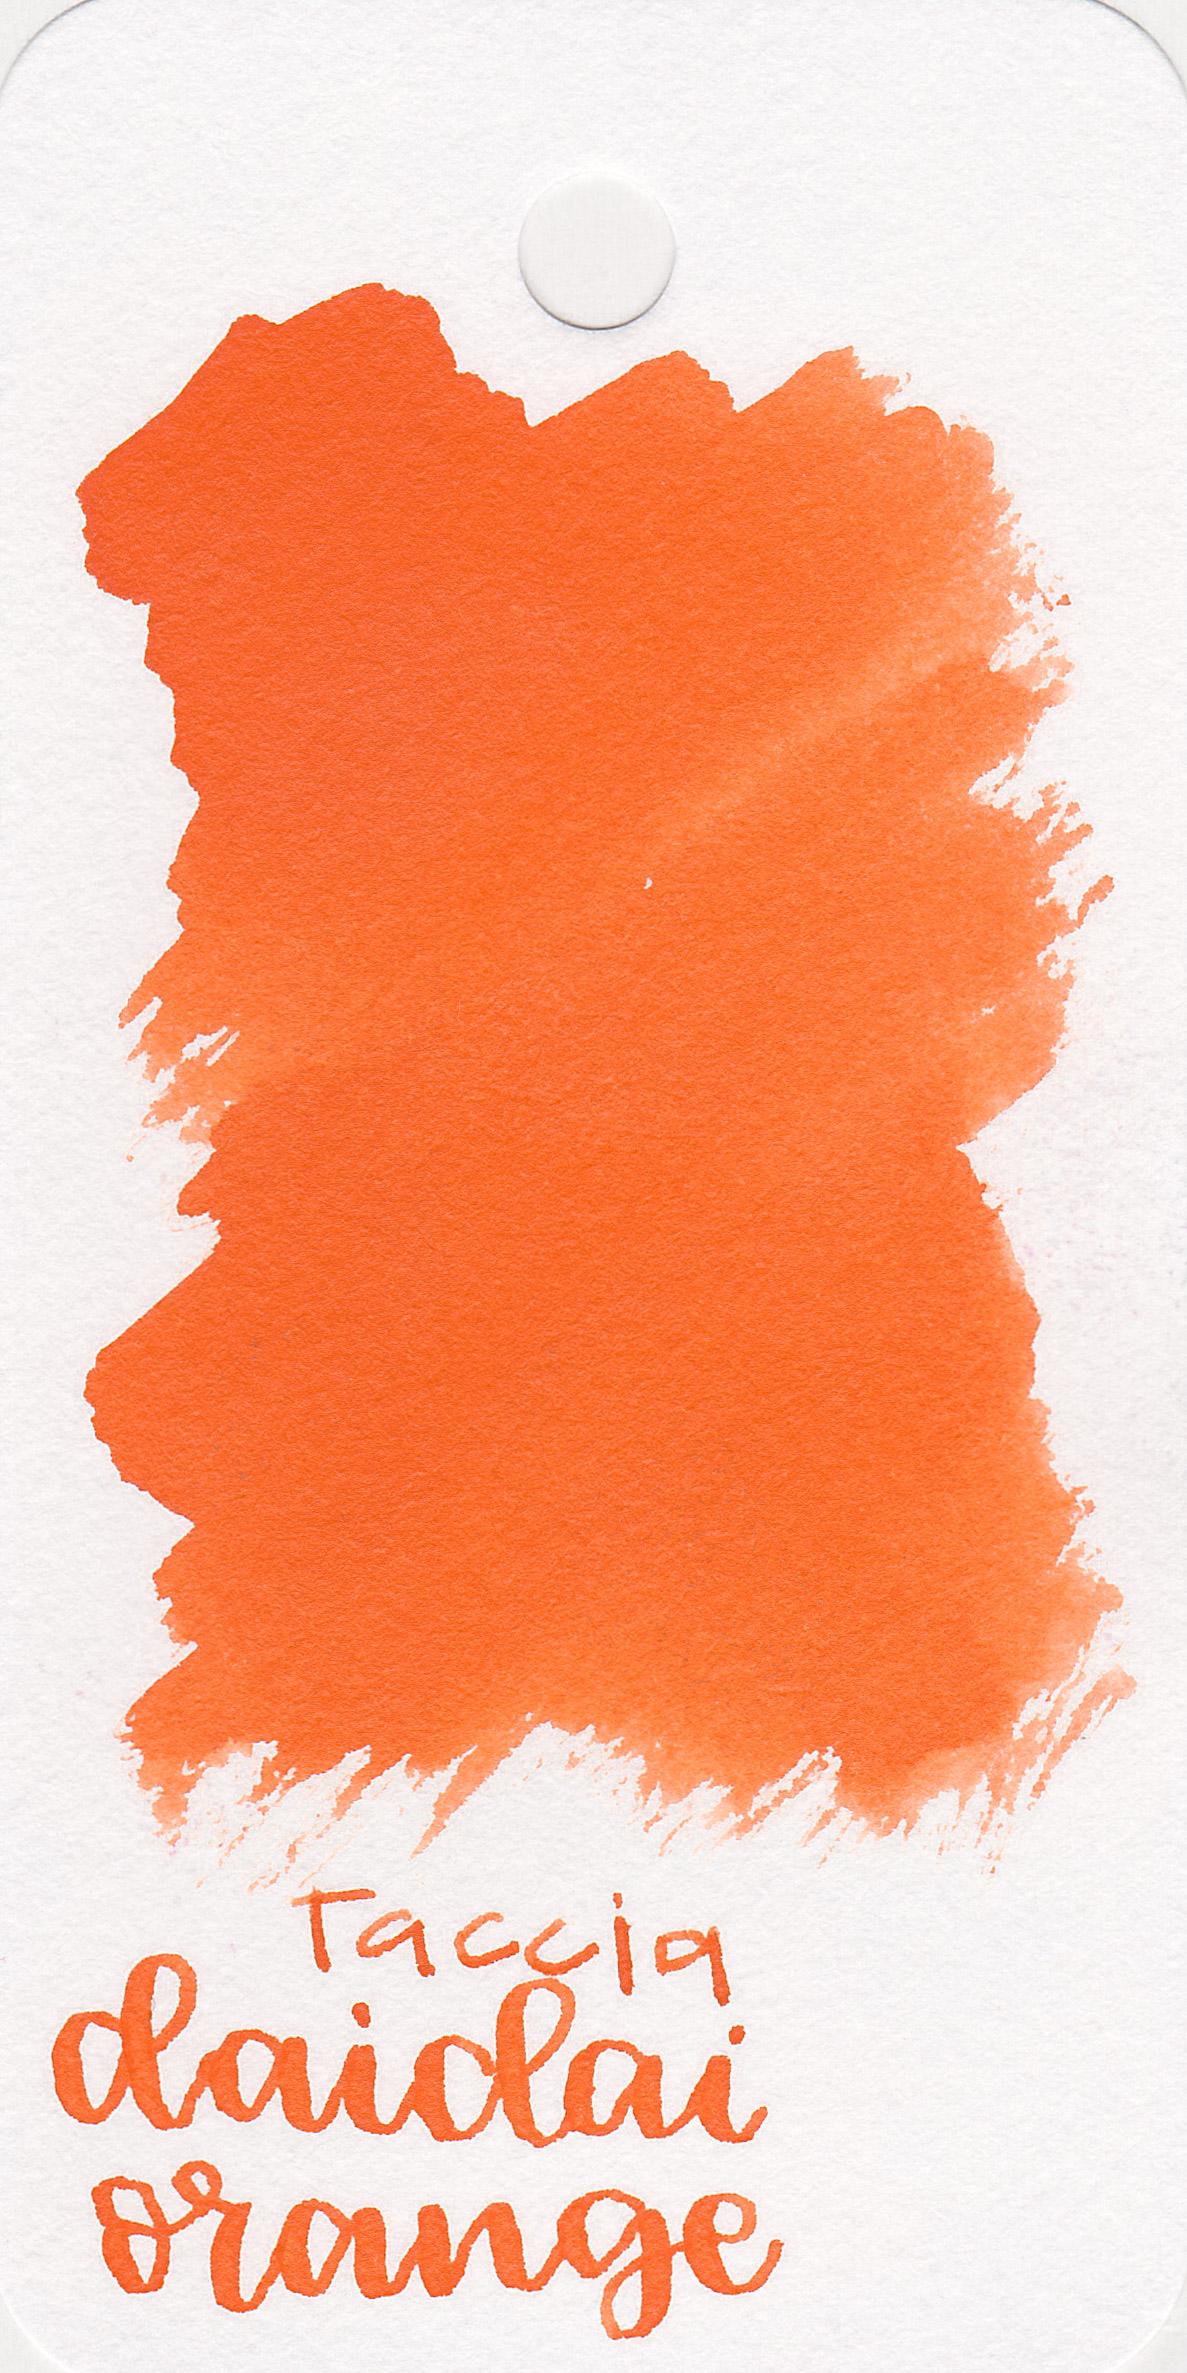 The color: - Daidai orange is a classic bright orange. I would call it a summery orange.